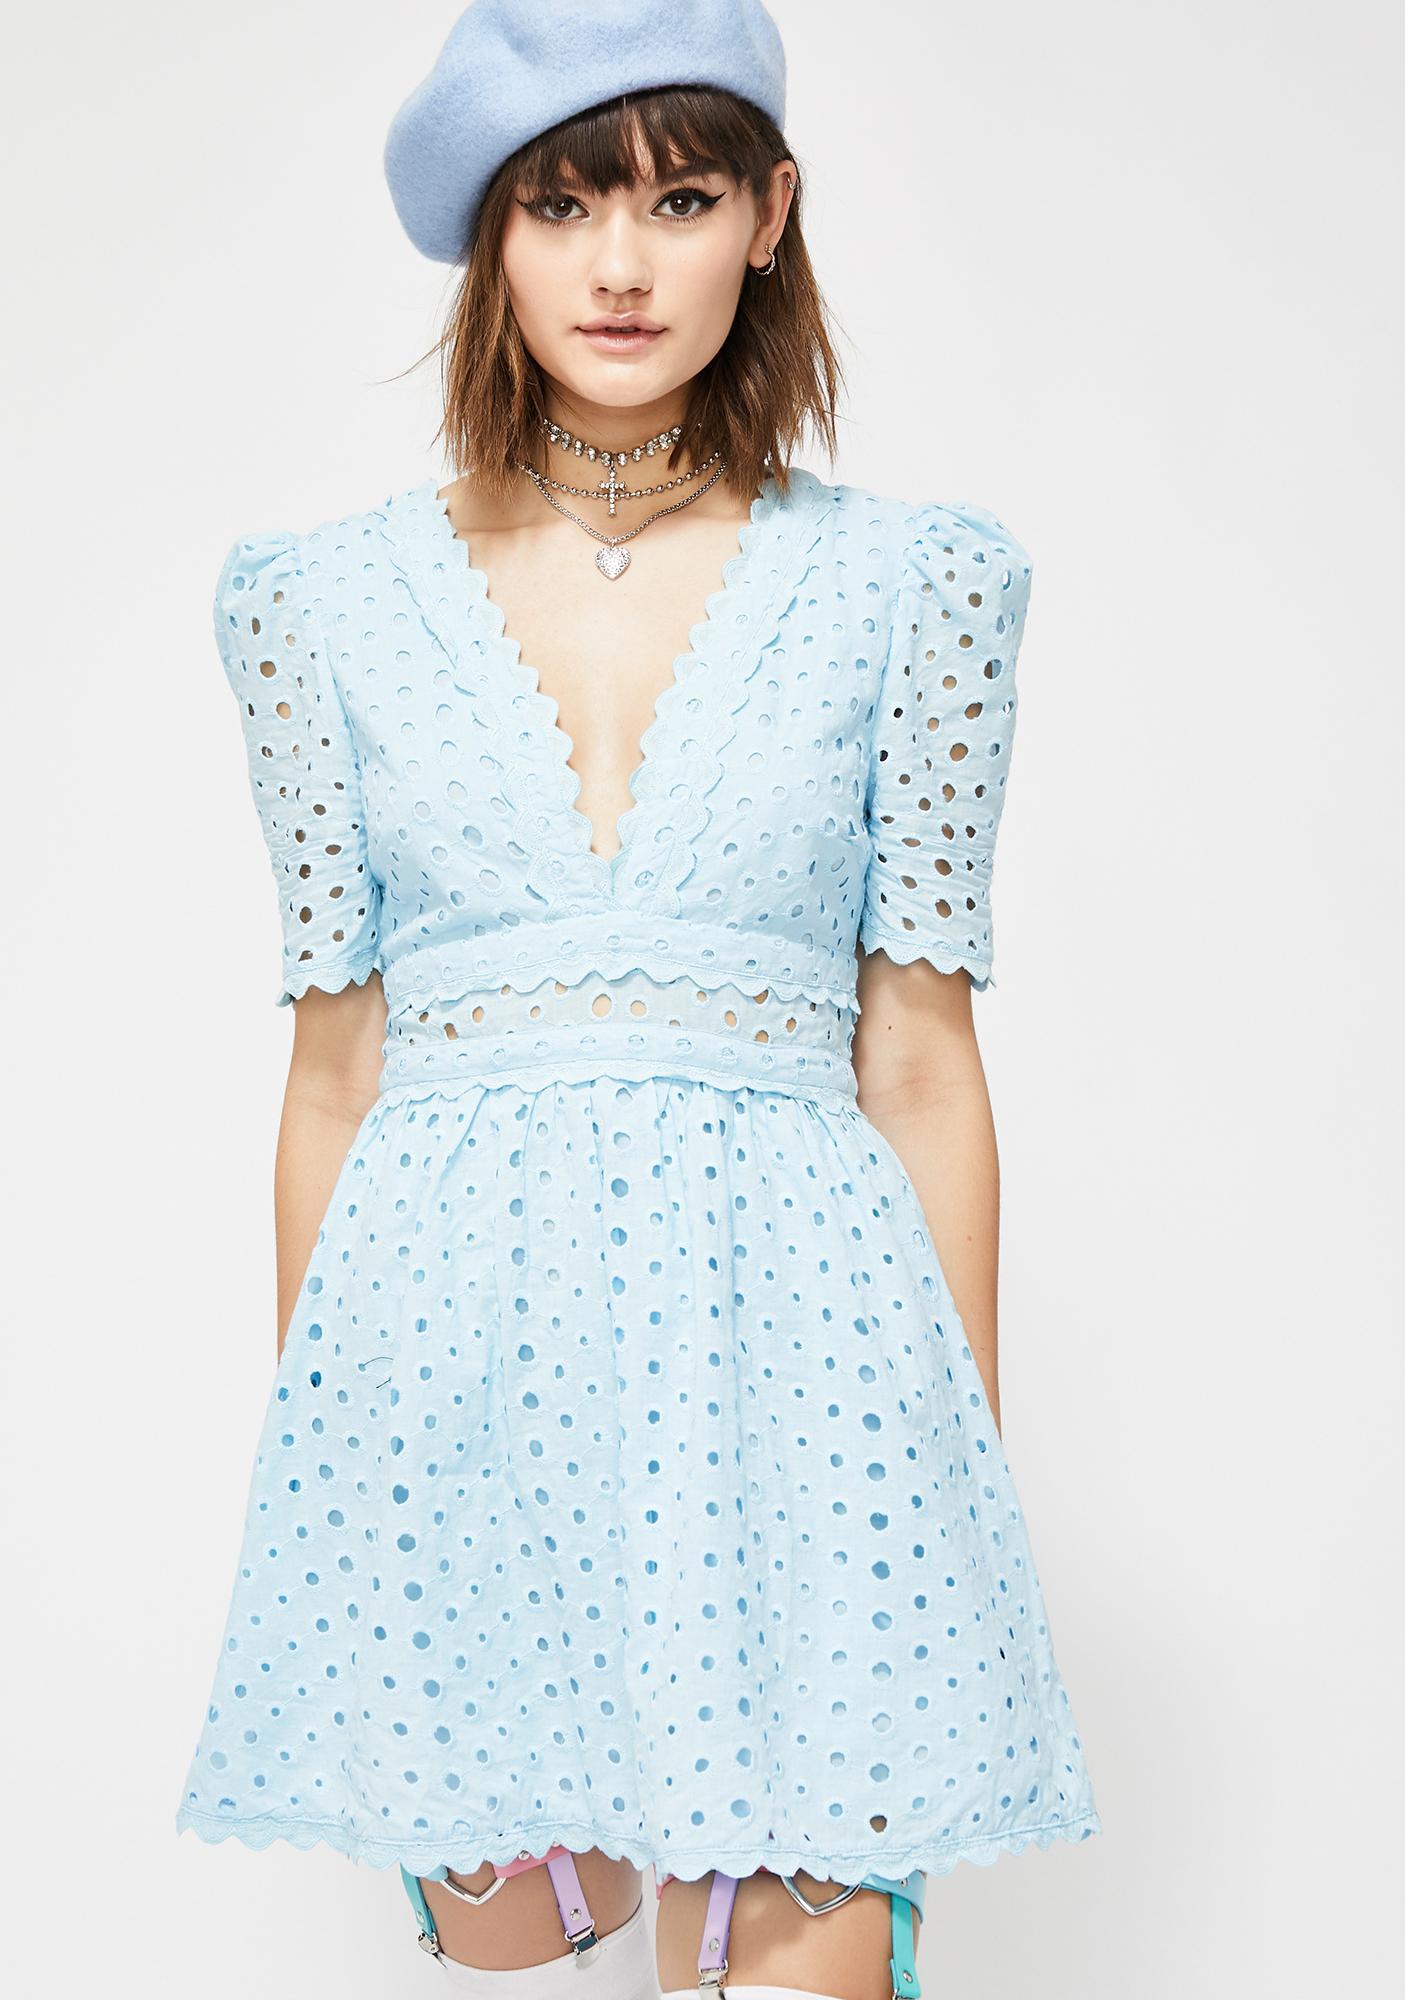 92d5930c1ed Bubble Pop Electric Mini Dress